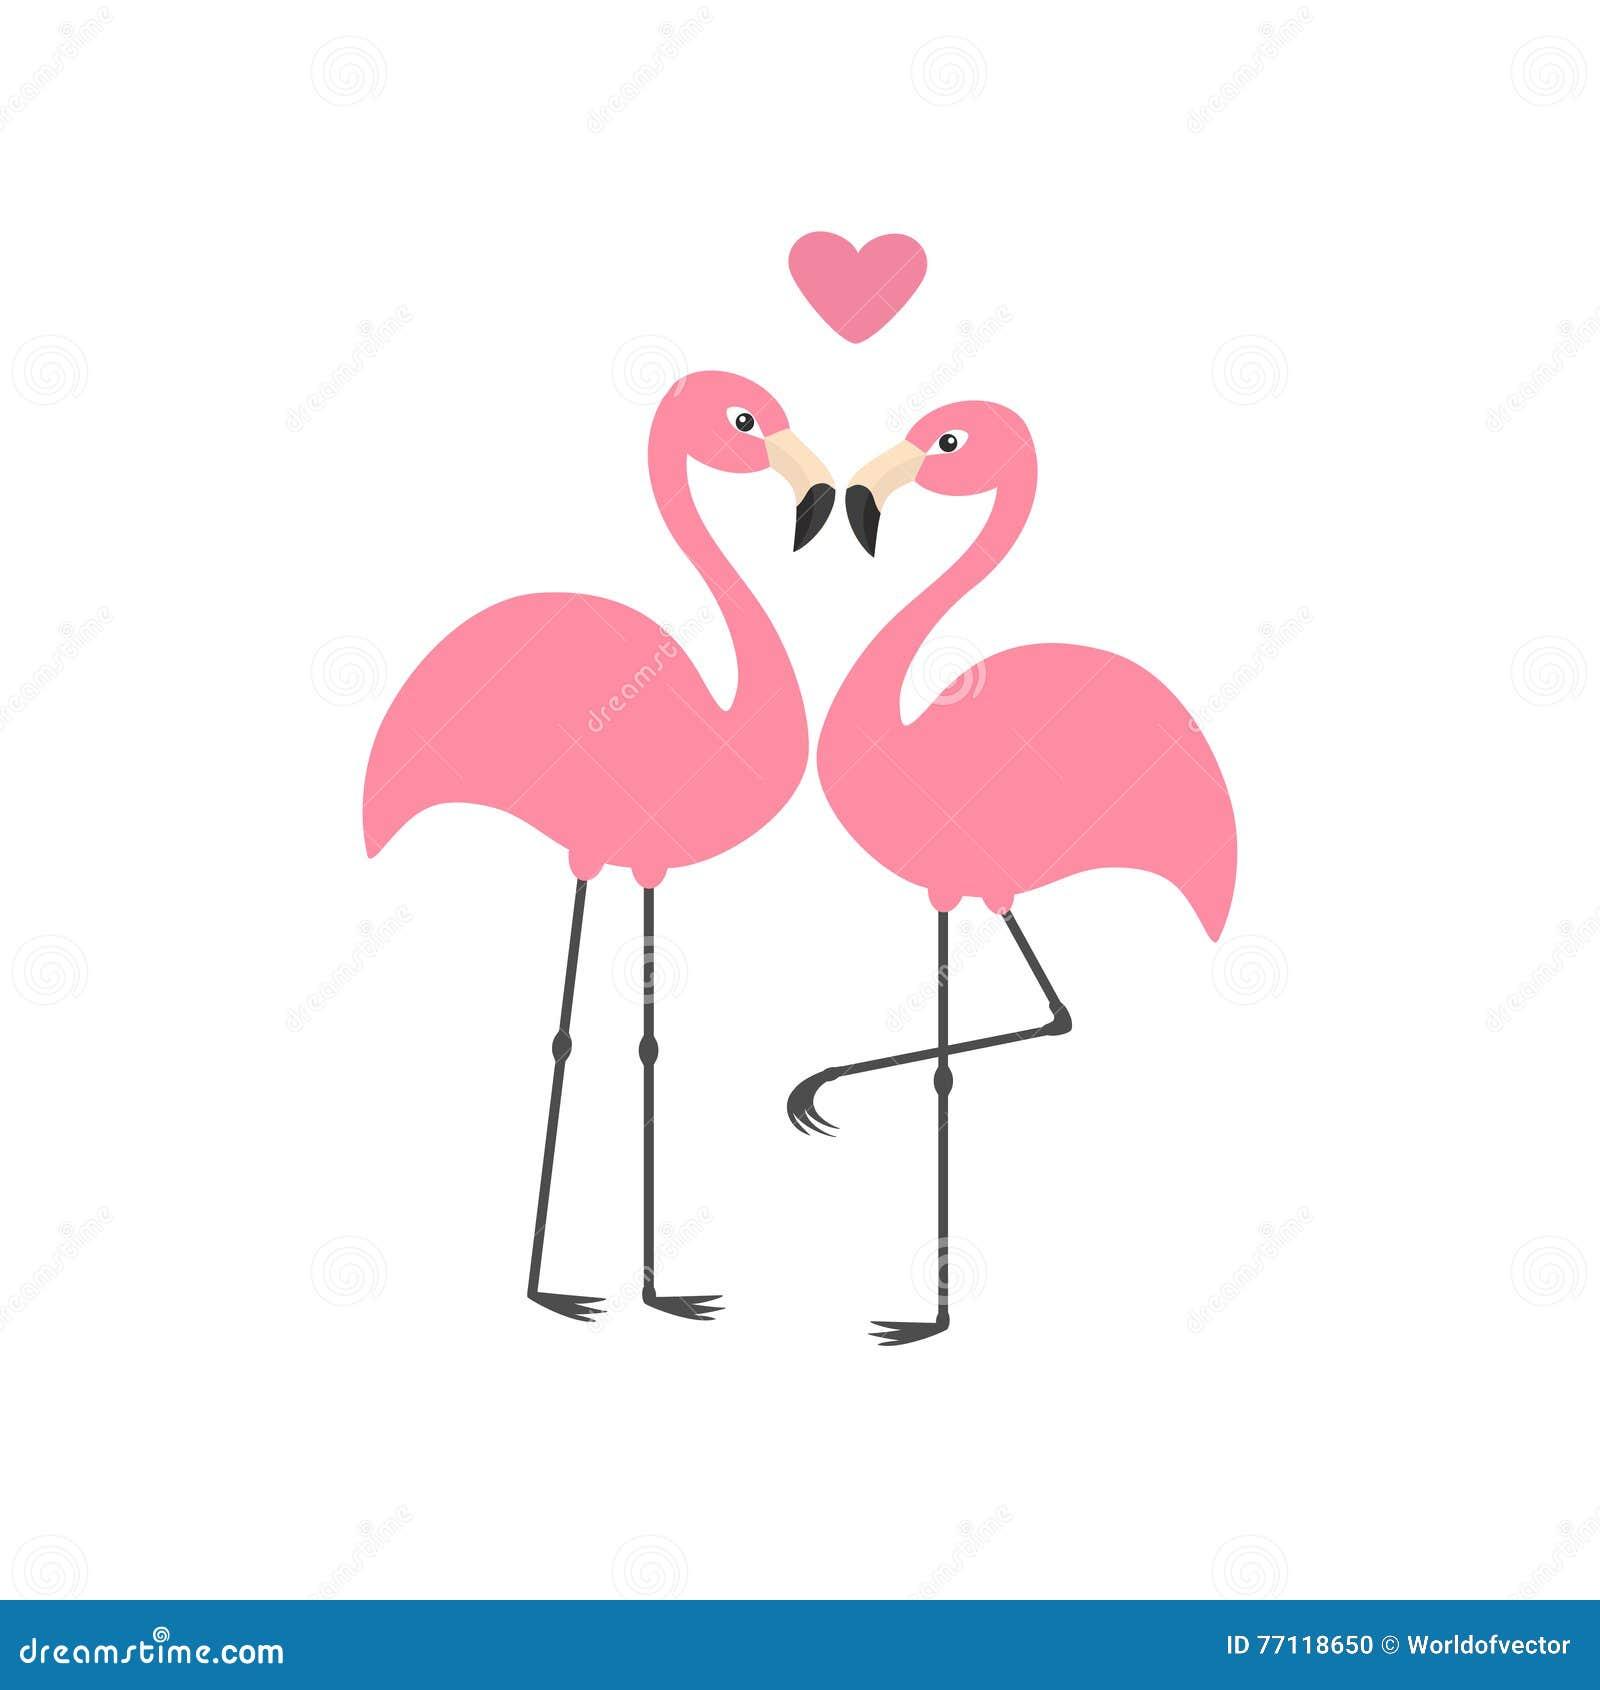 Cartoon Characters Love : The white flamingo in zoo stock image cartoondealer